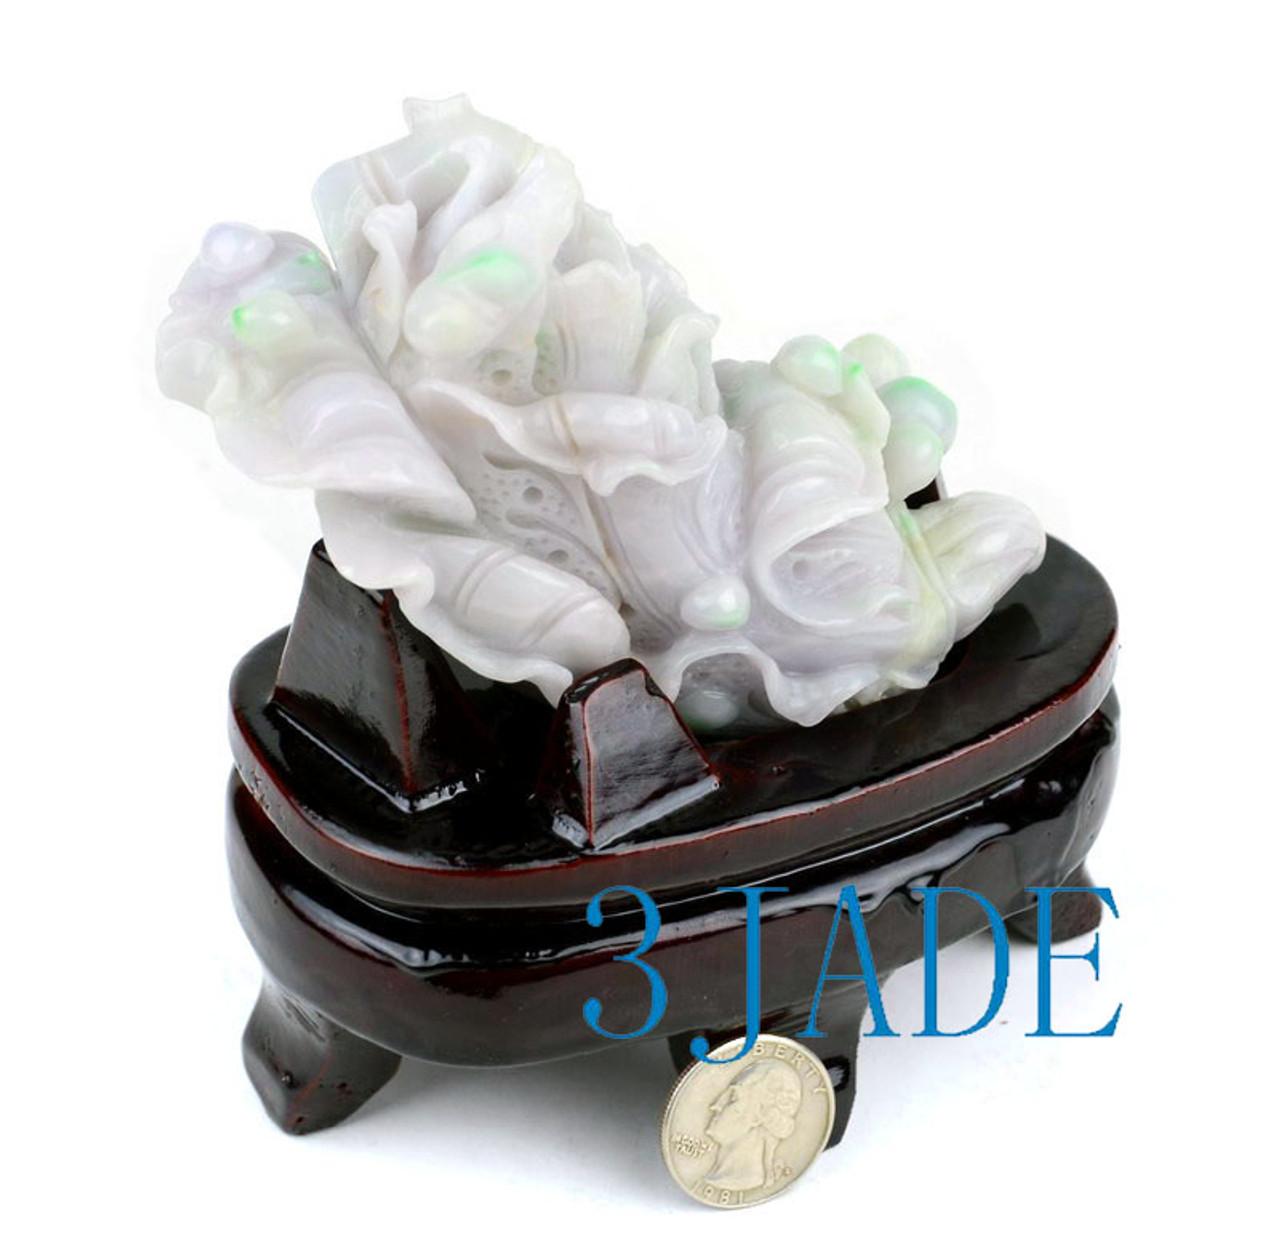 Jadeite Jade Cabbage Carving